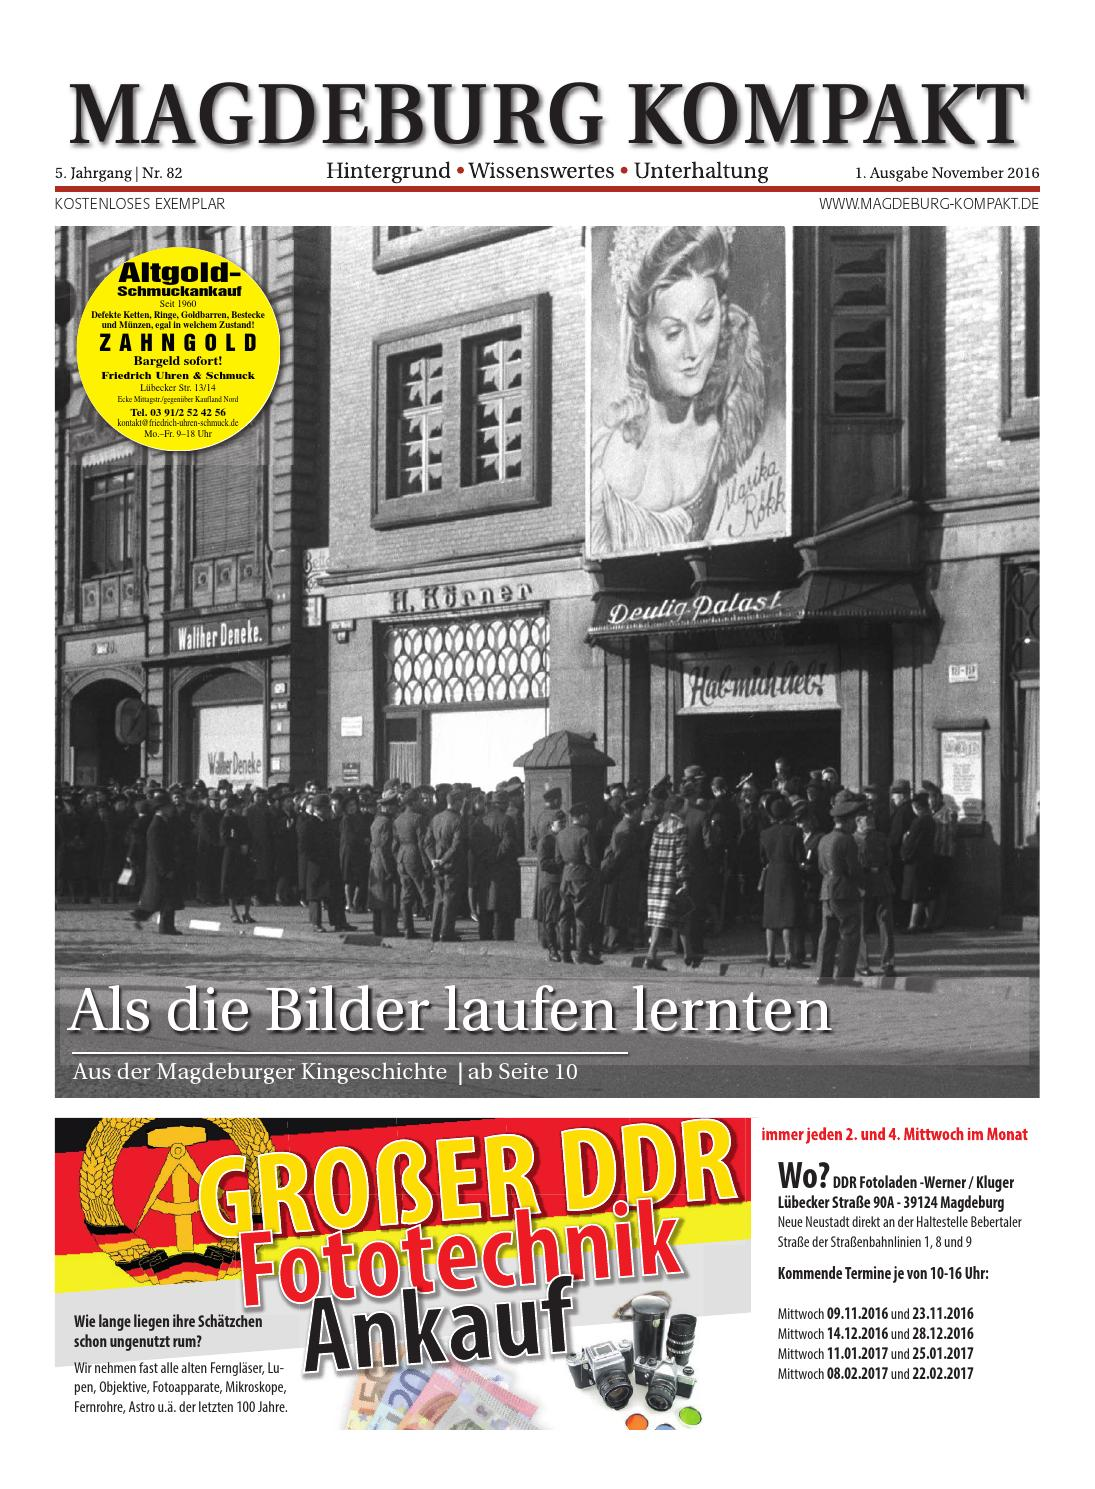 Cinestar In Magdeburg